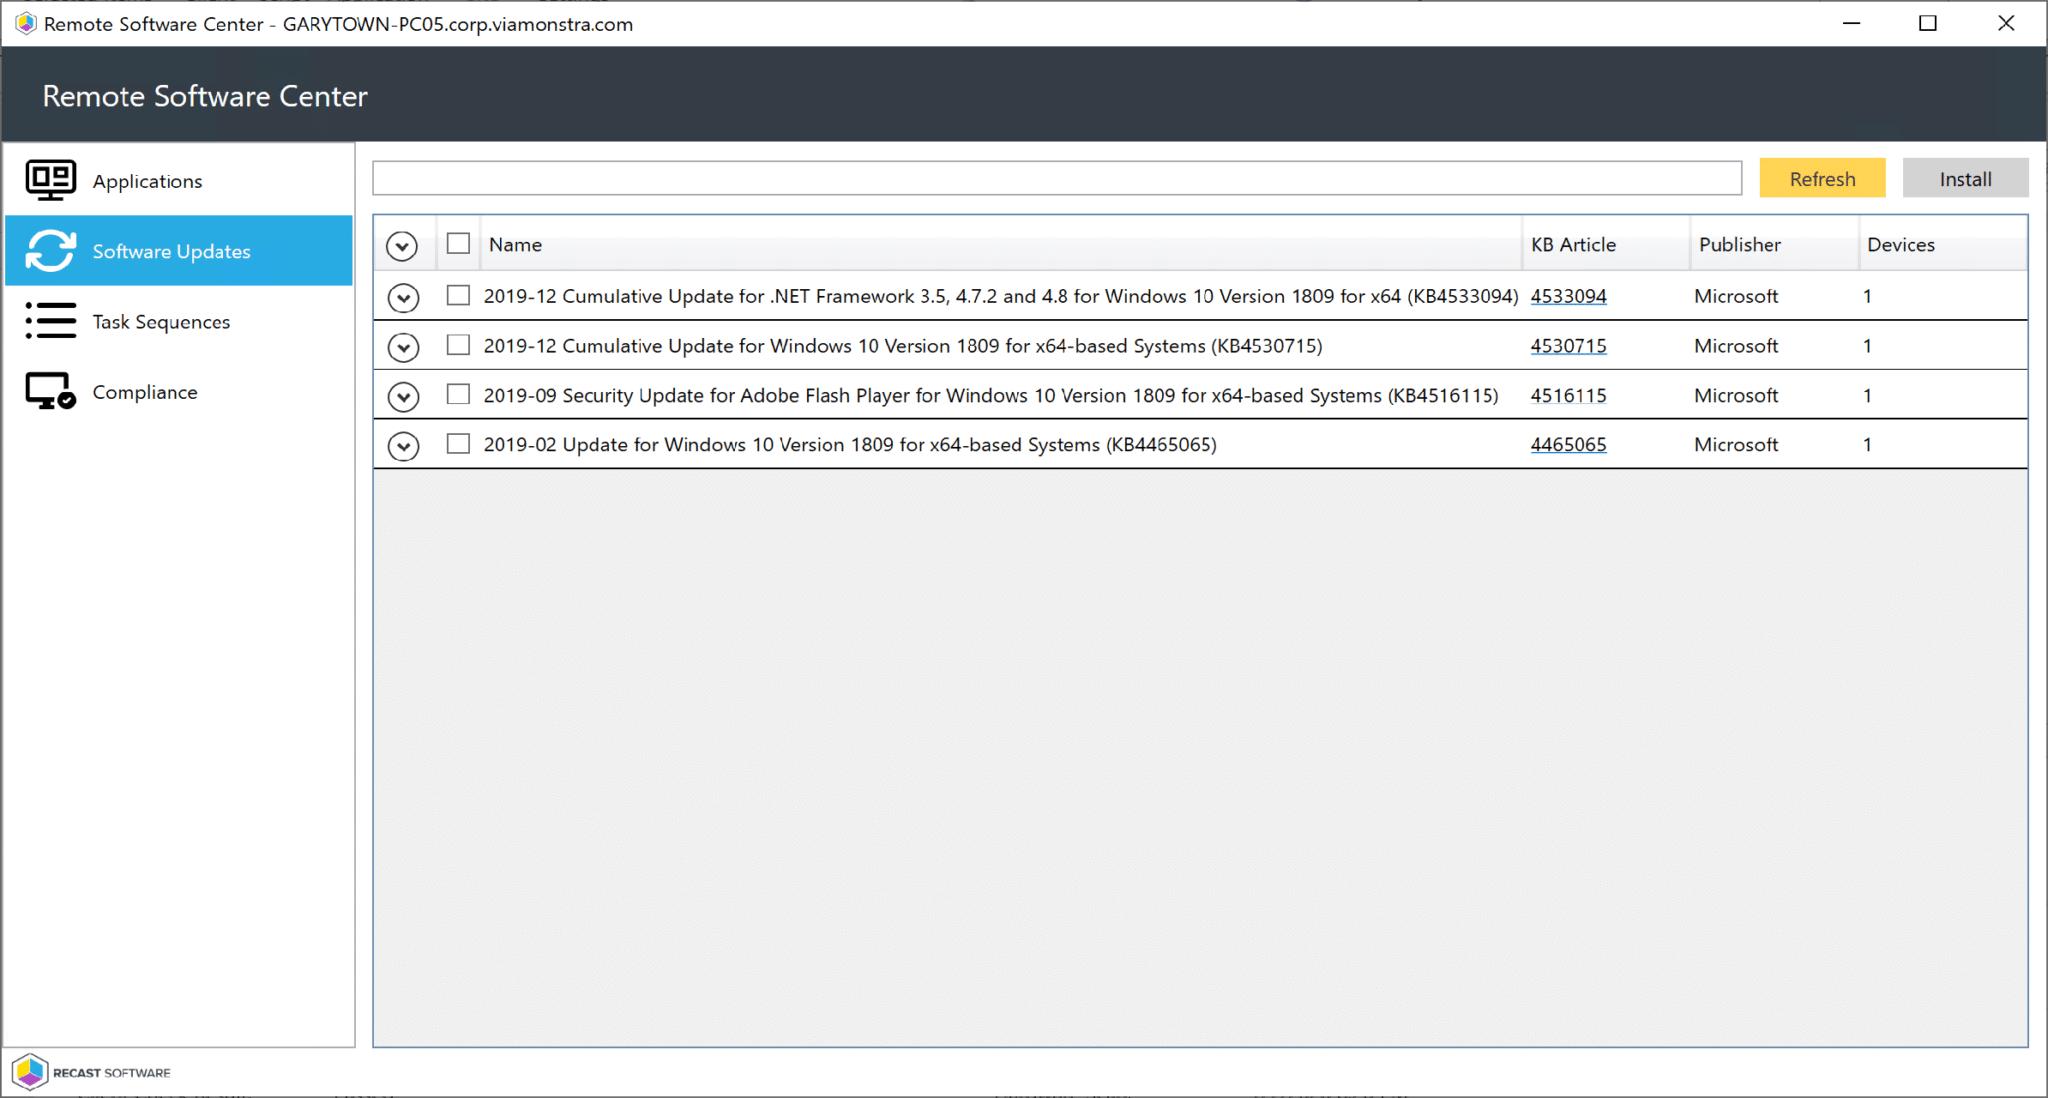 Remote Software Center Software Updates Tab